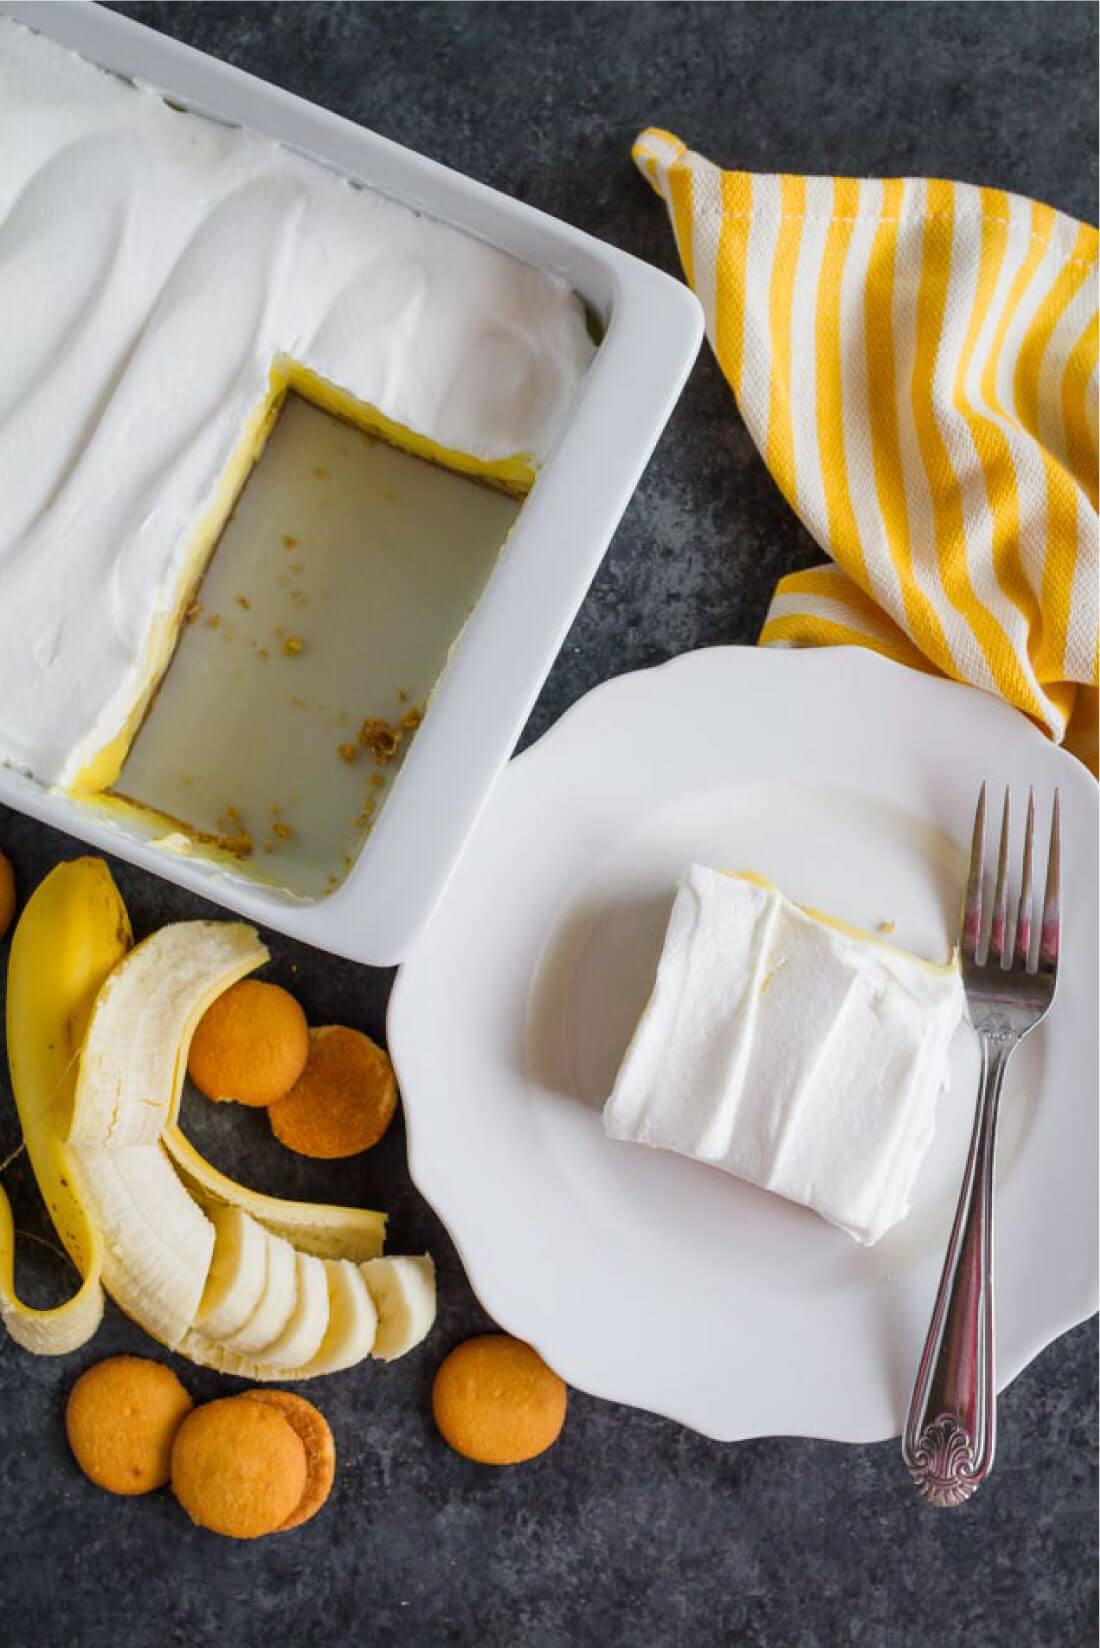 The most delicious Triple Layer Banana Cream Pie Bars - a good, easy dessert recipe via thirtyhandmadedays.com